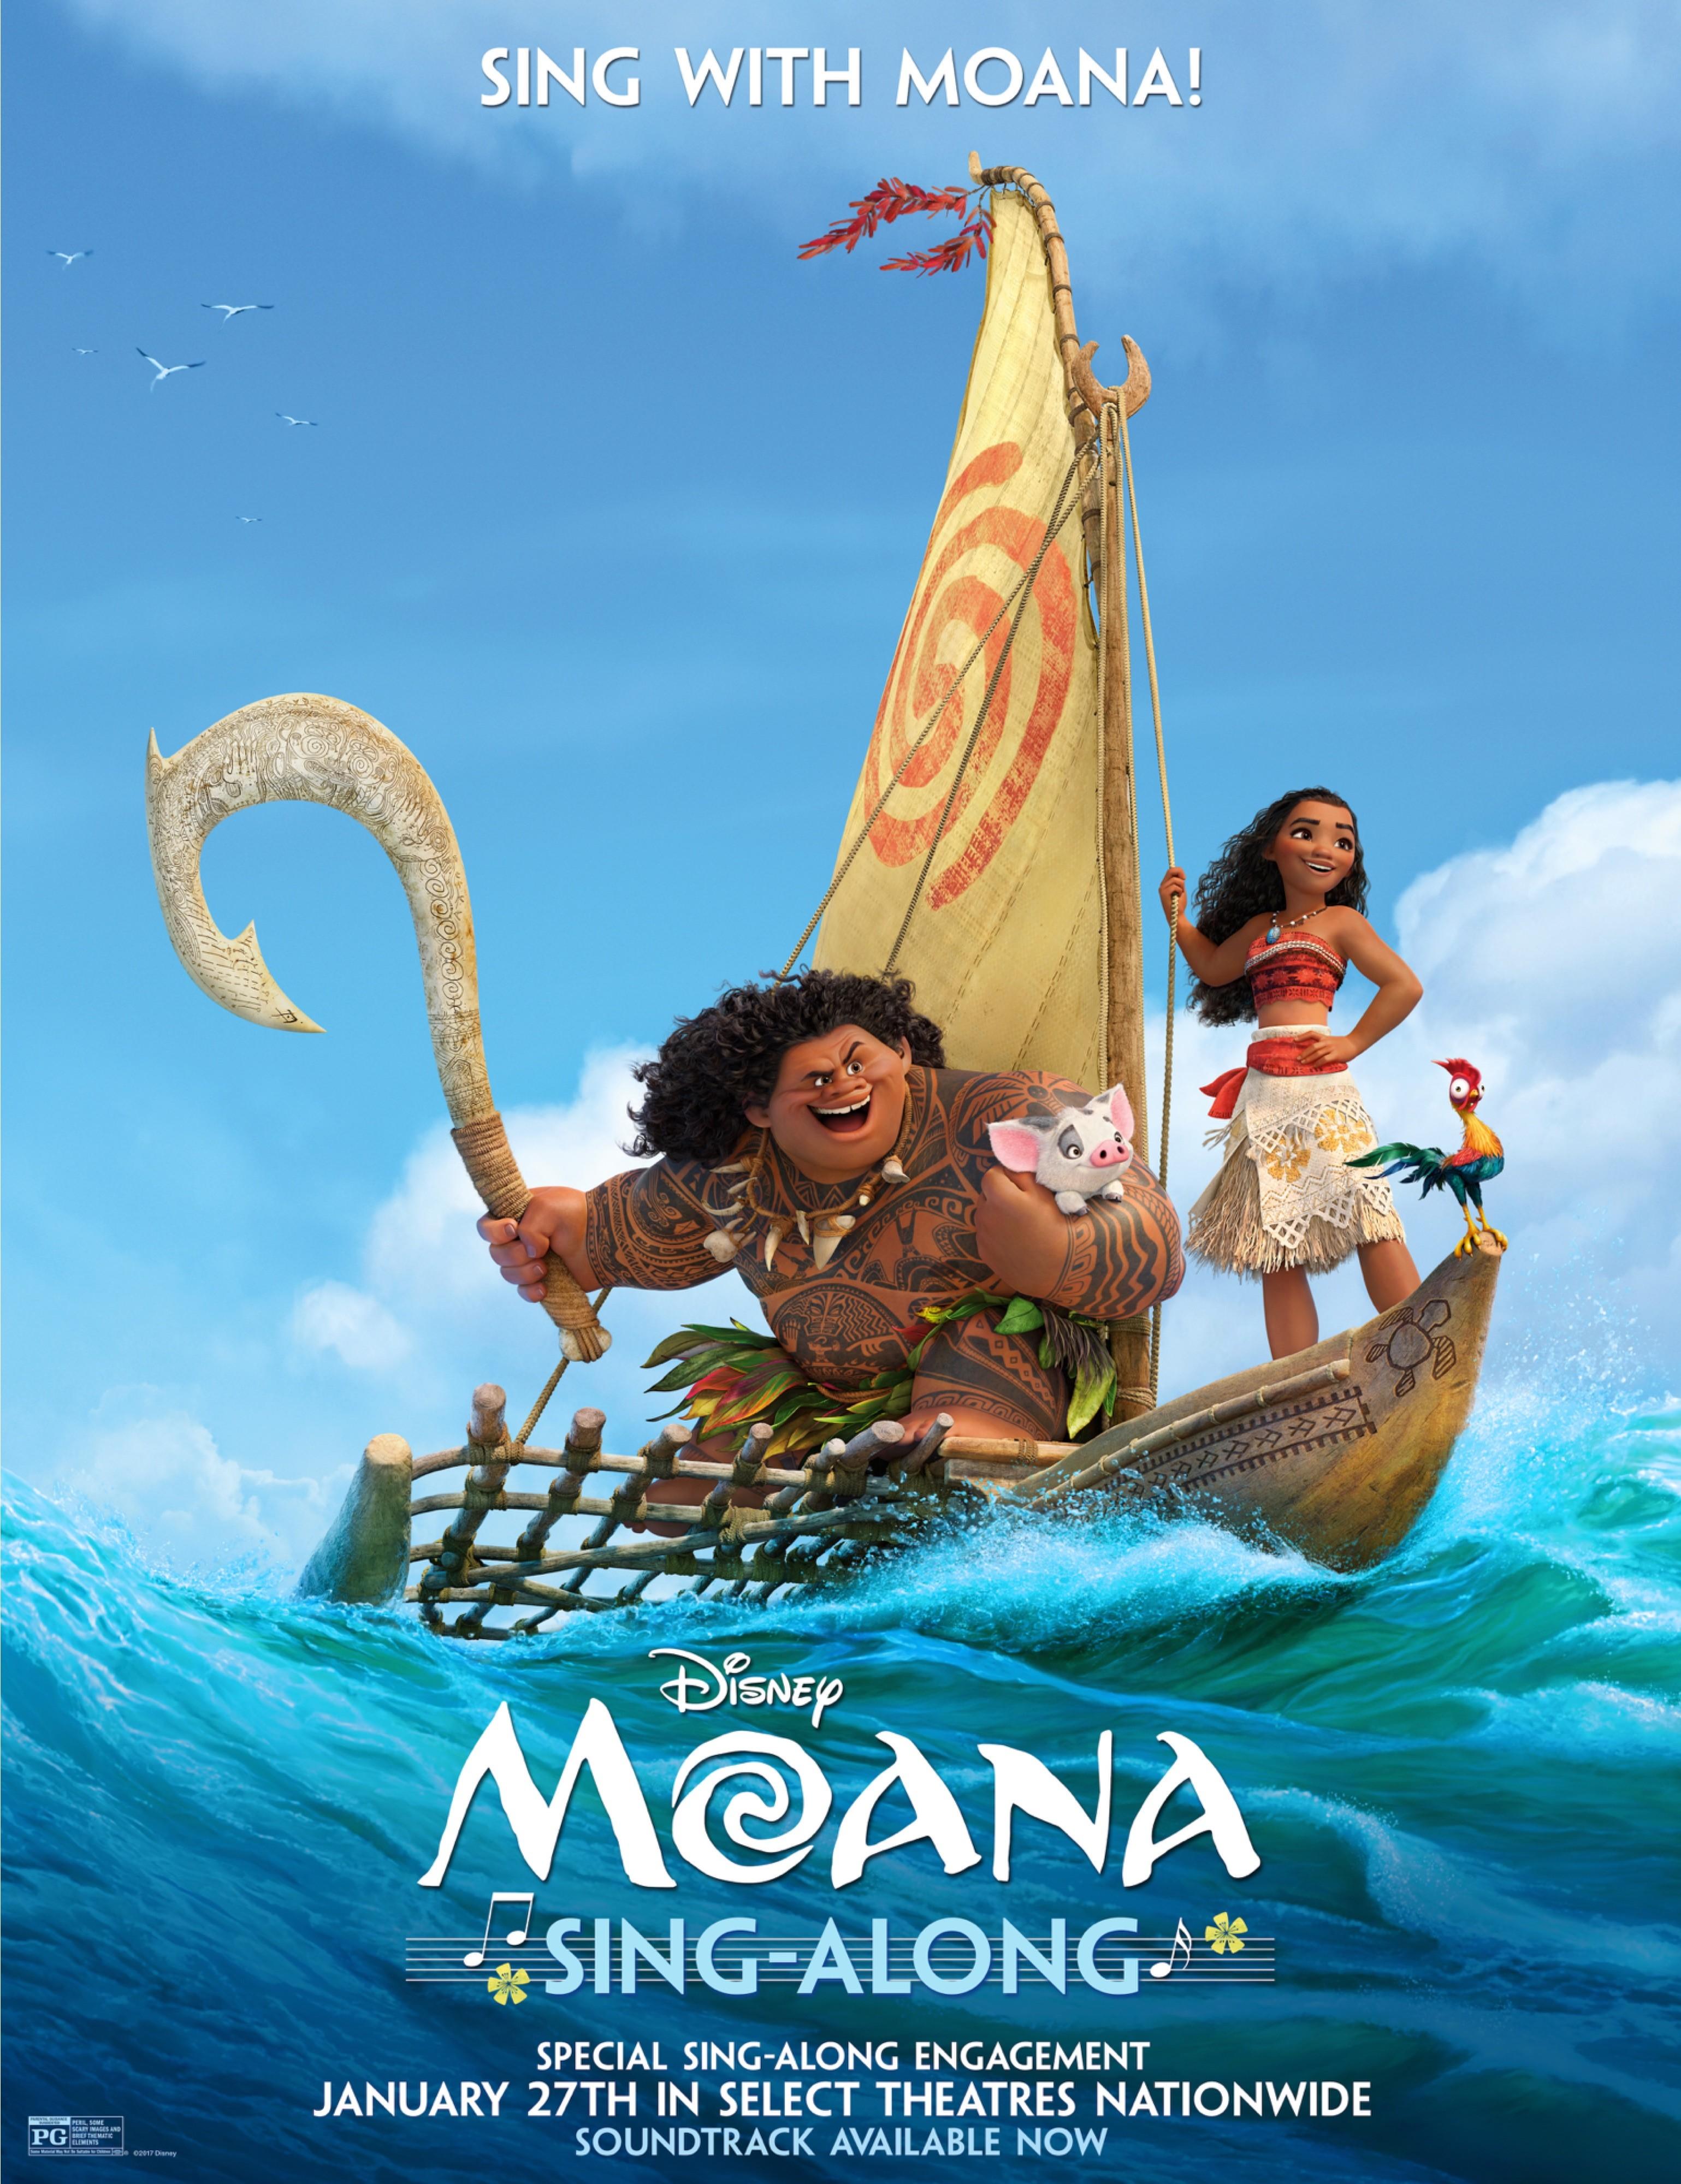 MOANA • Sing-Along